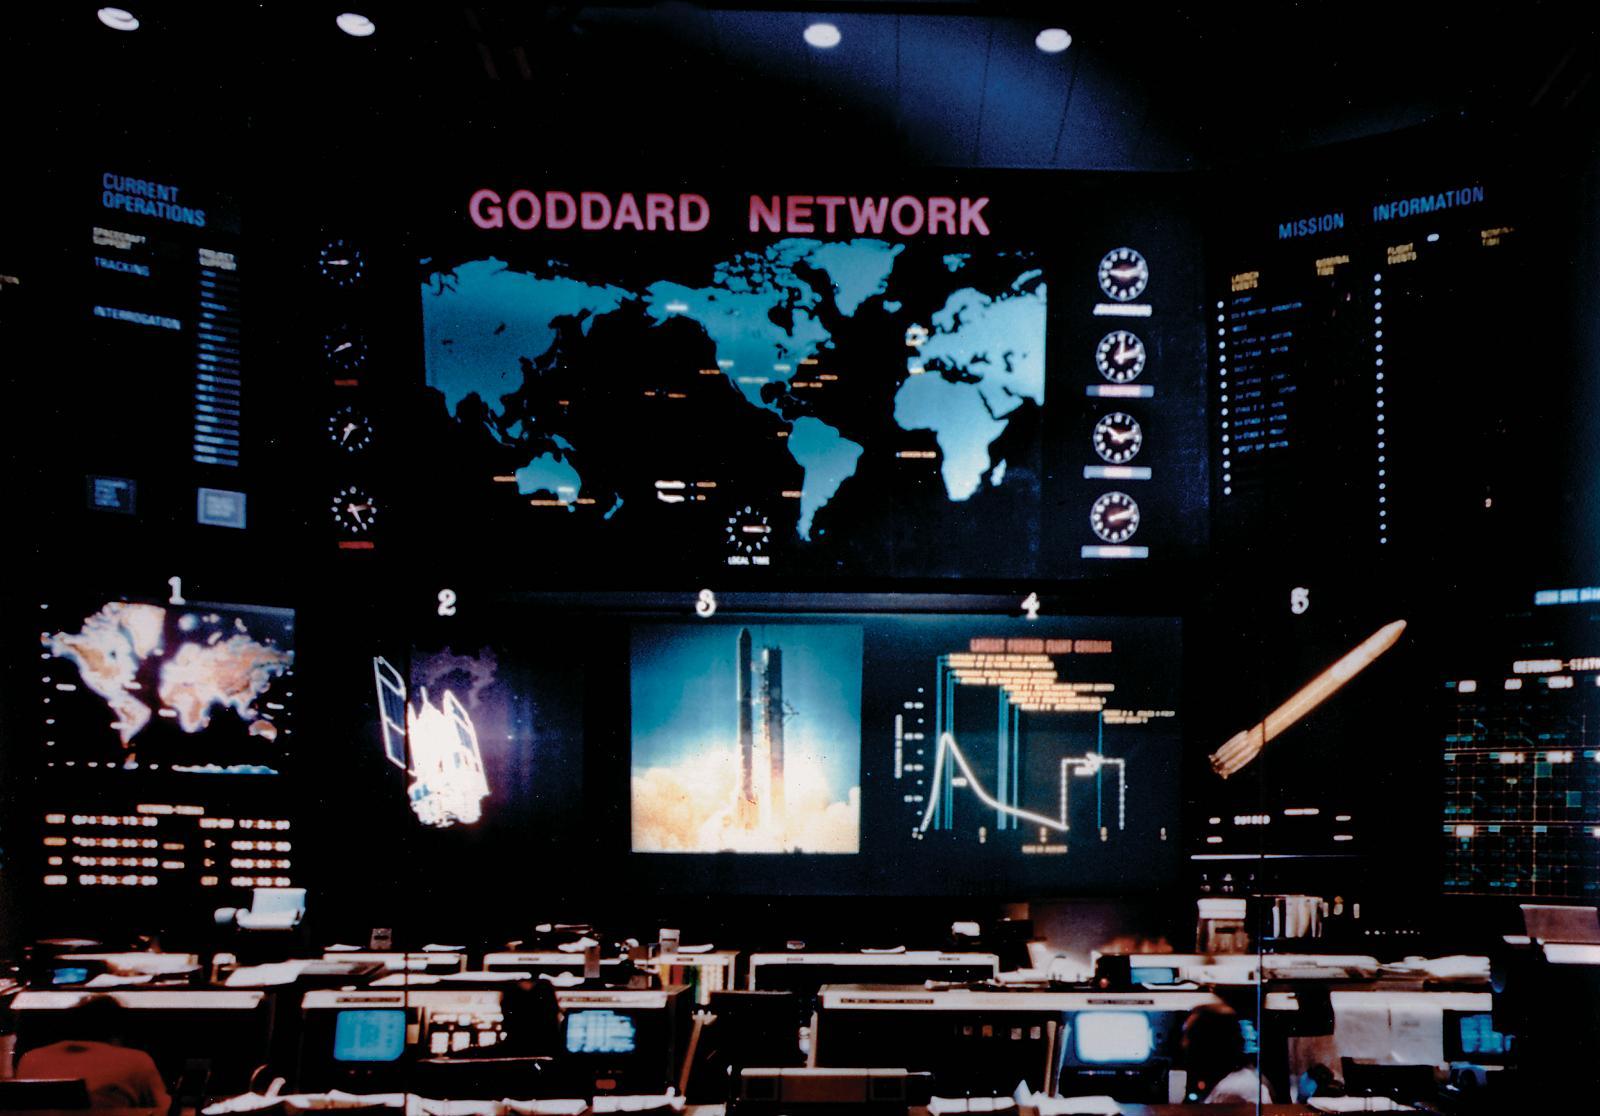 GoddardNetwork.jpg